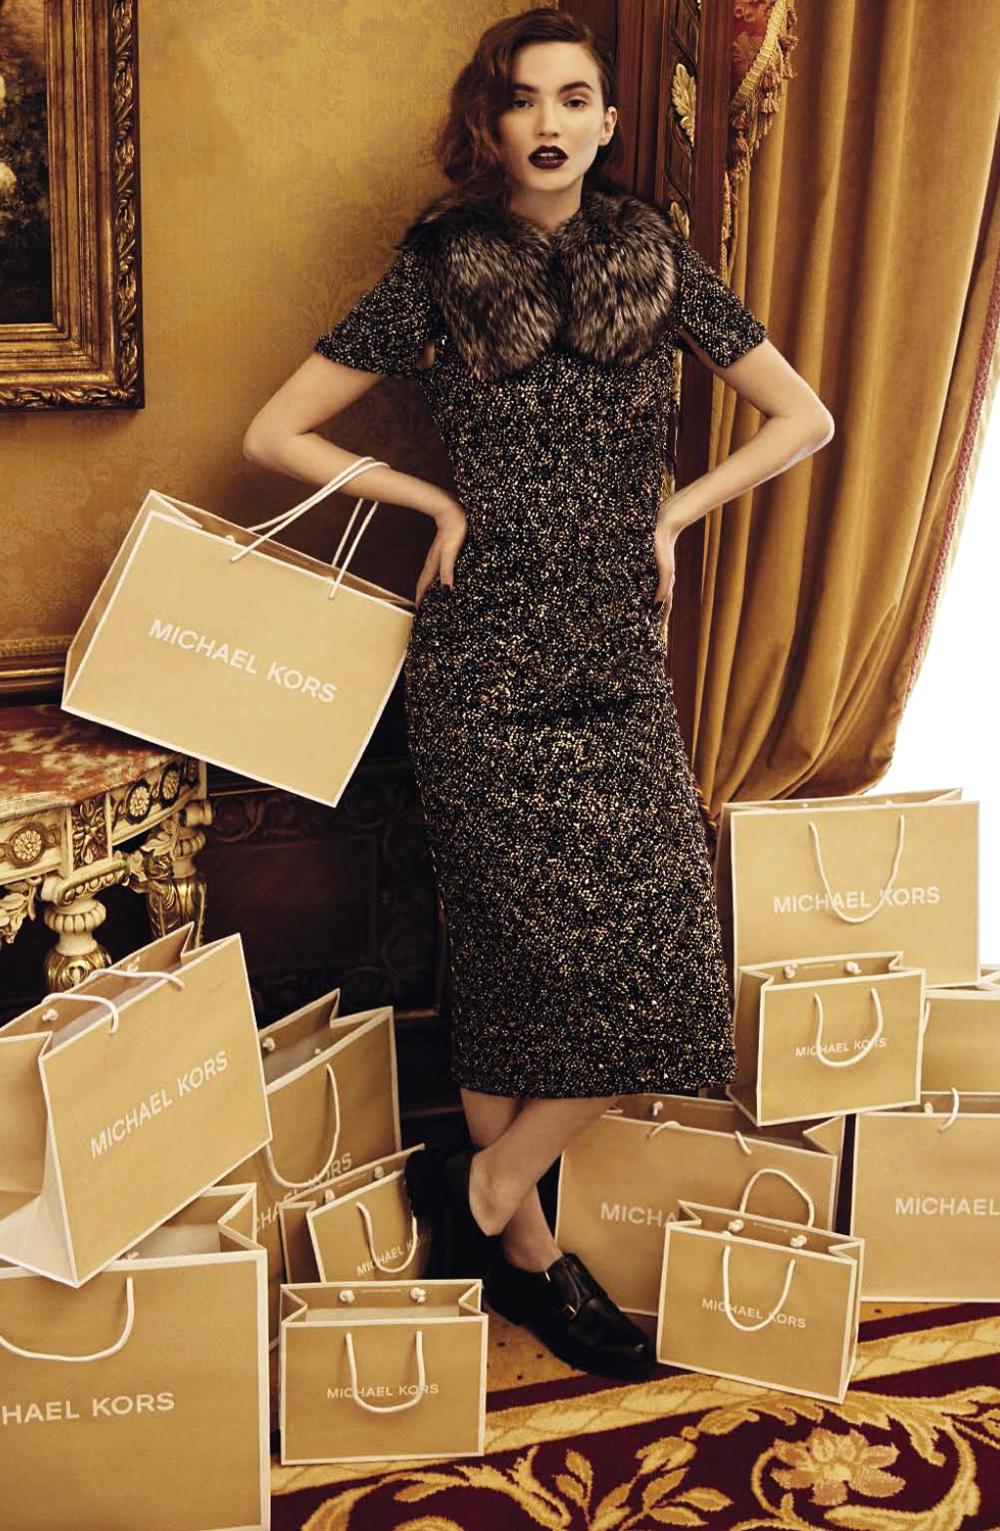 Dalia Gunther wearing Michael Kors for It List! / Glamour Italia October 2015 (photography: Andoni & Arantxa, styling: Edoardo Marchiori) via www.fashionedbylove.co.uk